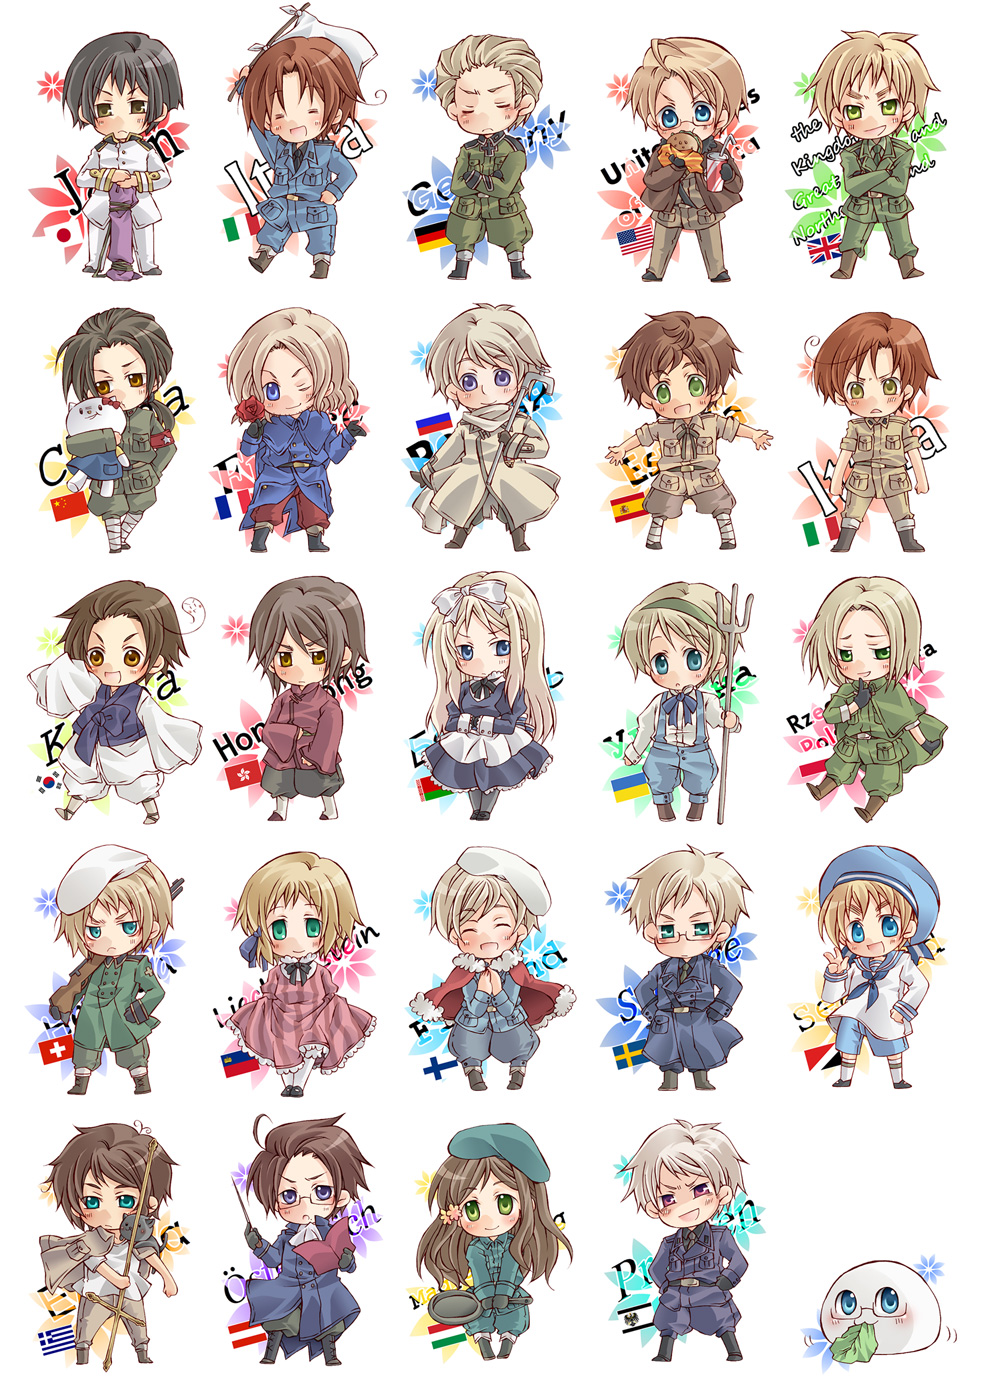 Anime Characters Powers : Axis powers hetalia mobile wallpaper zerochan